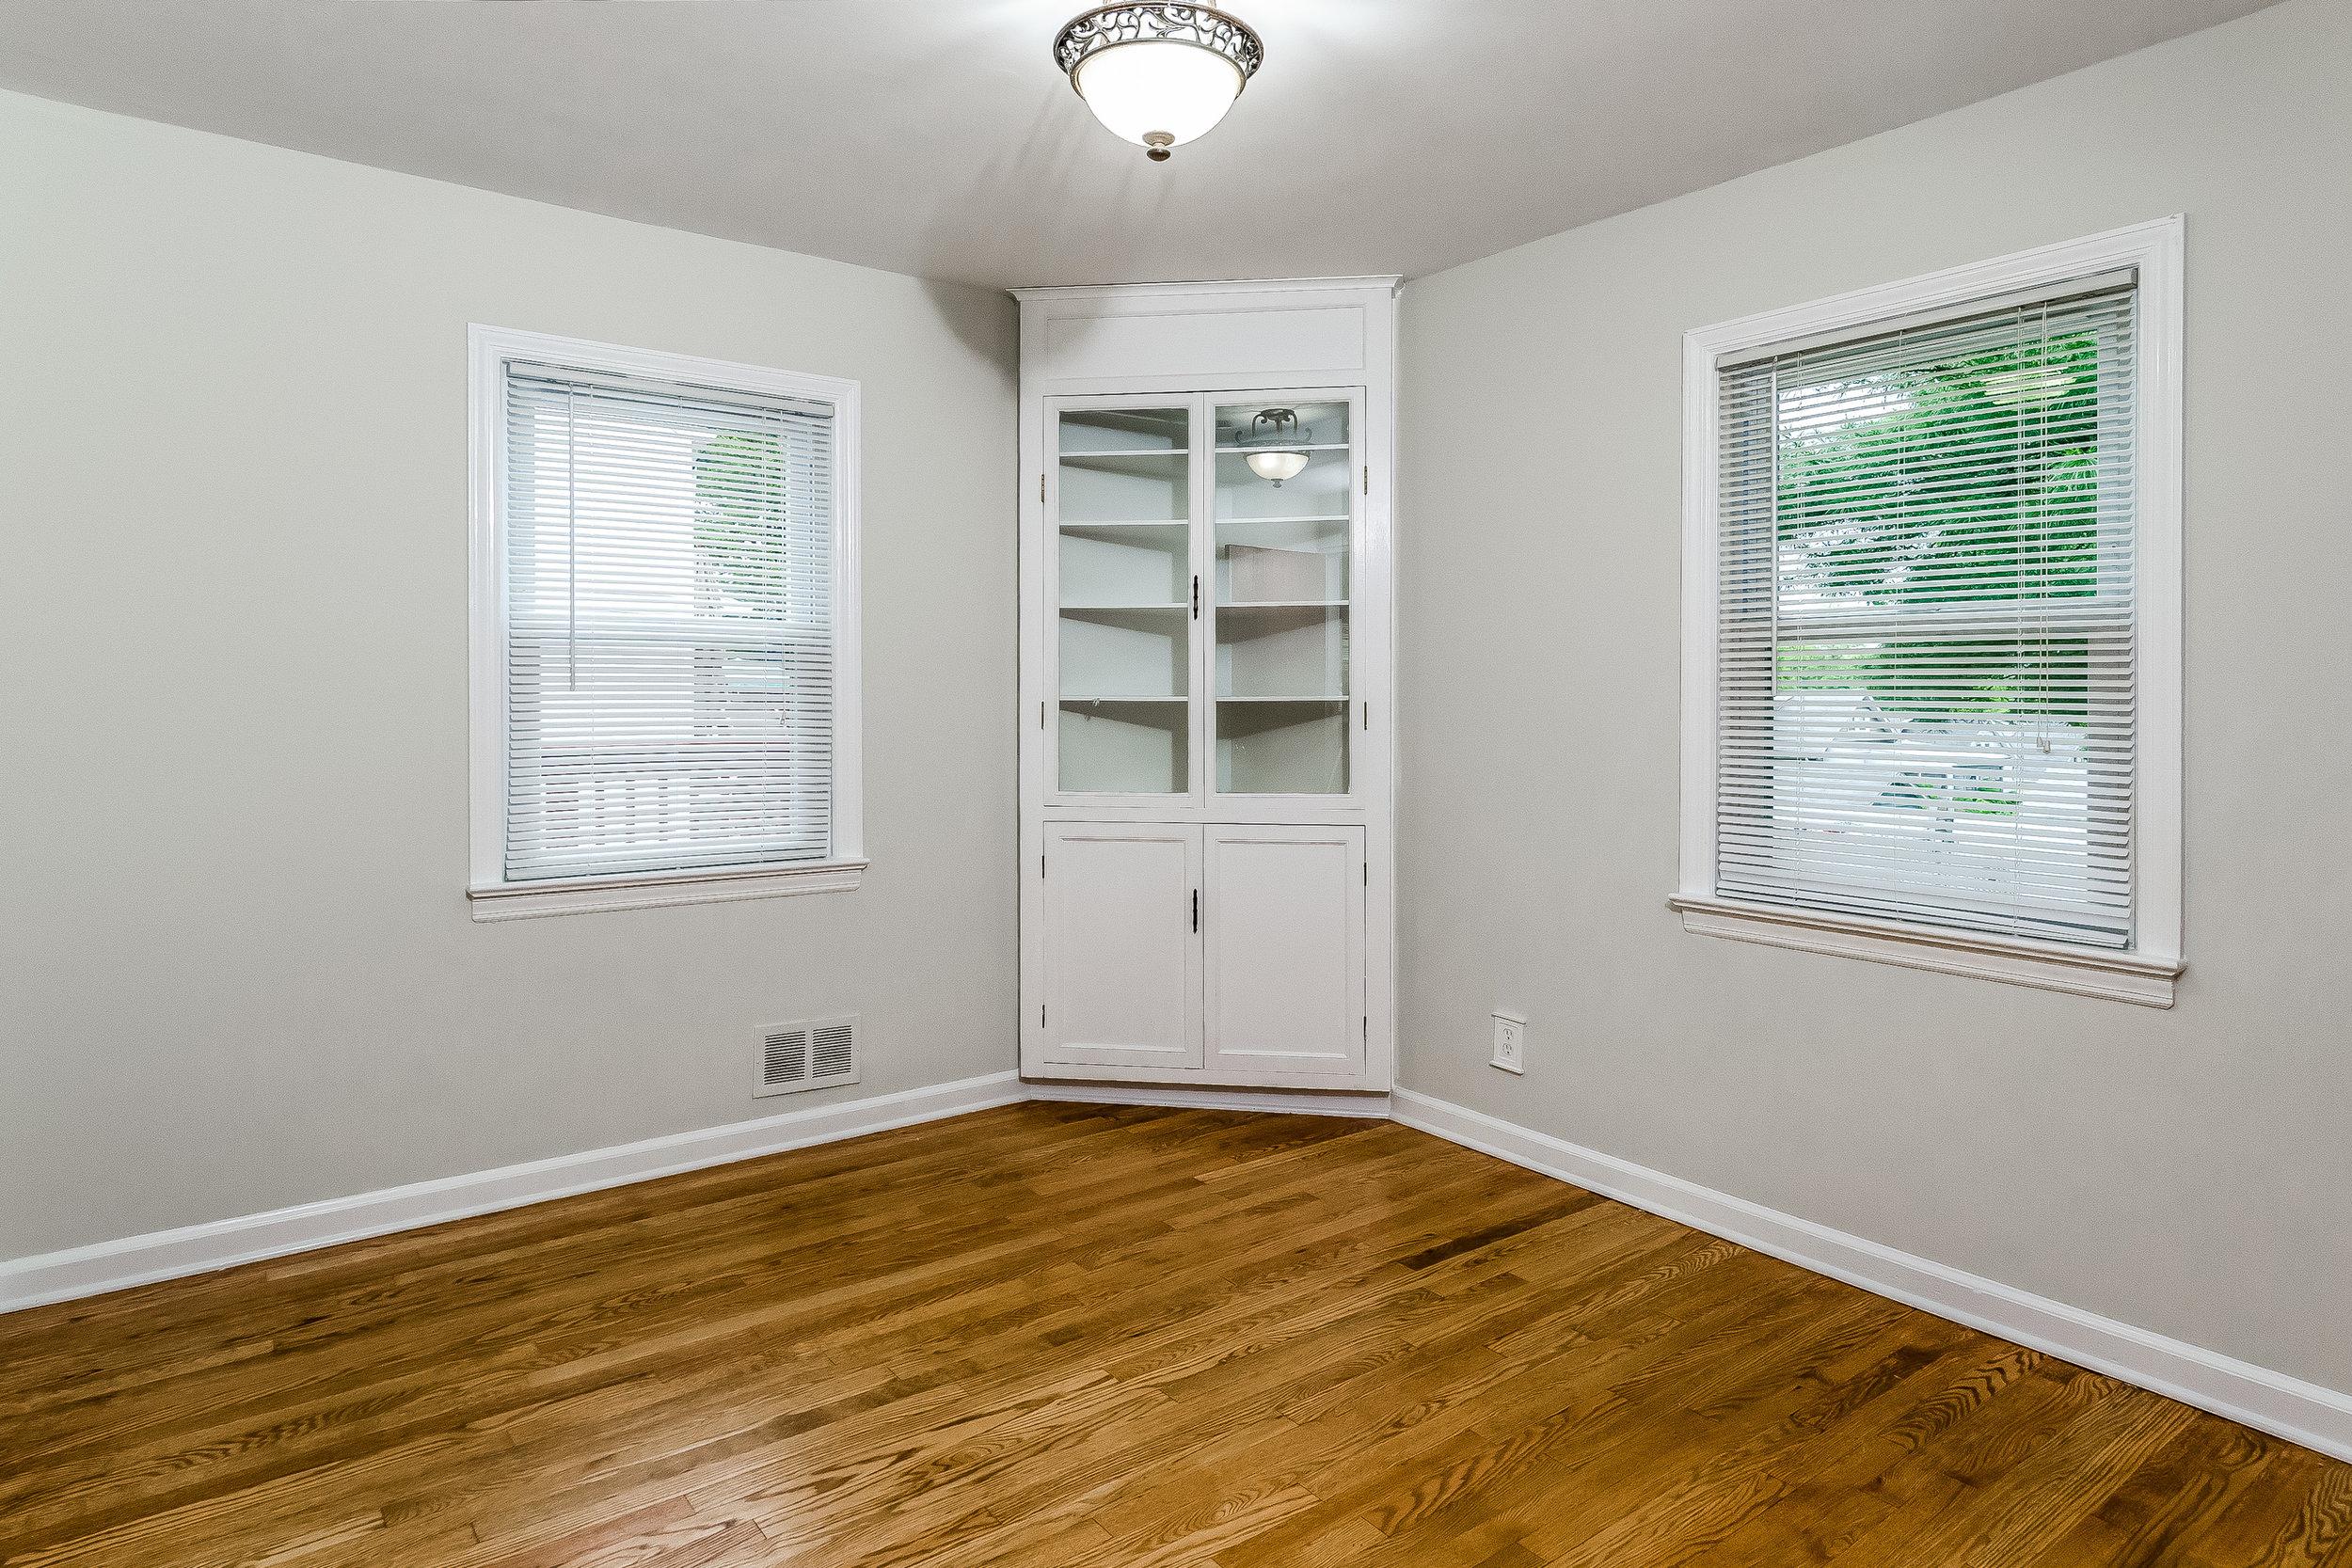 016-photo-bedroom-5786536.jpg